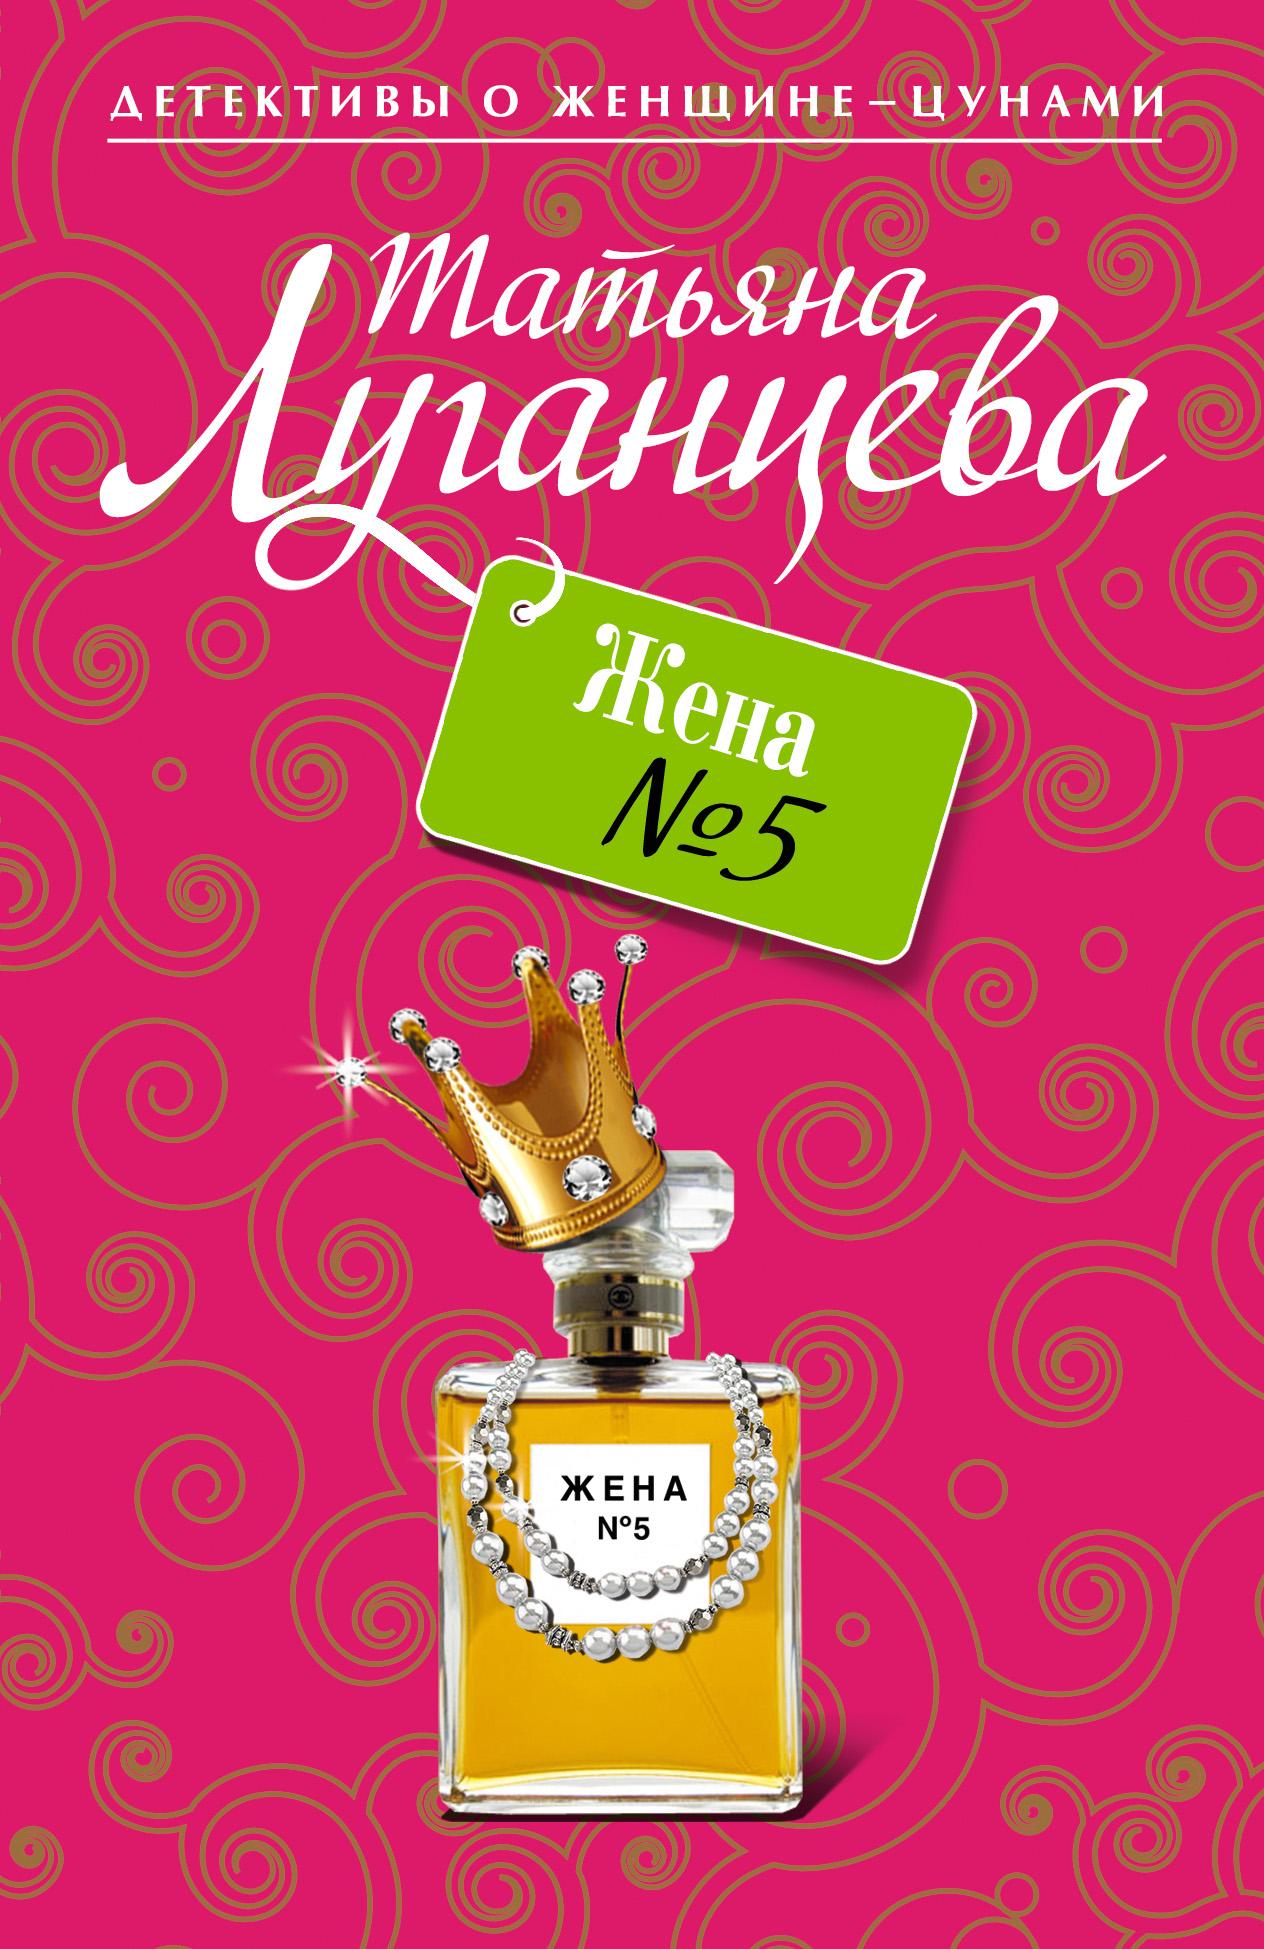 купить Татьяна Луганцева Жена №5 по цене 99.9 рублей